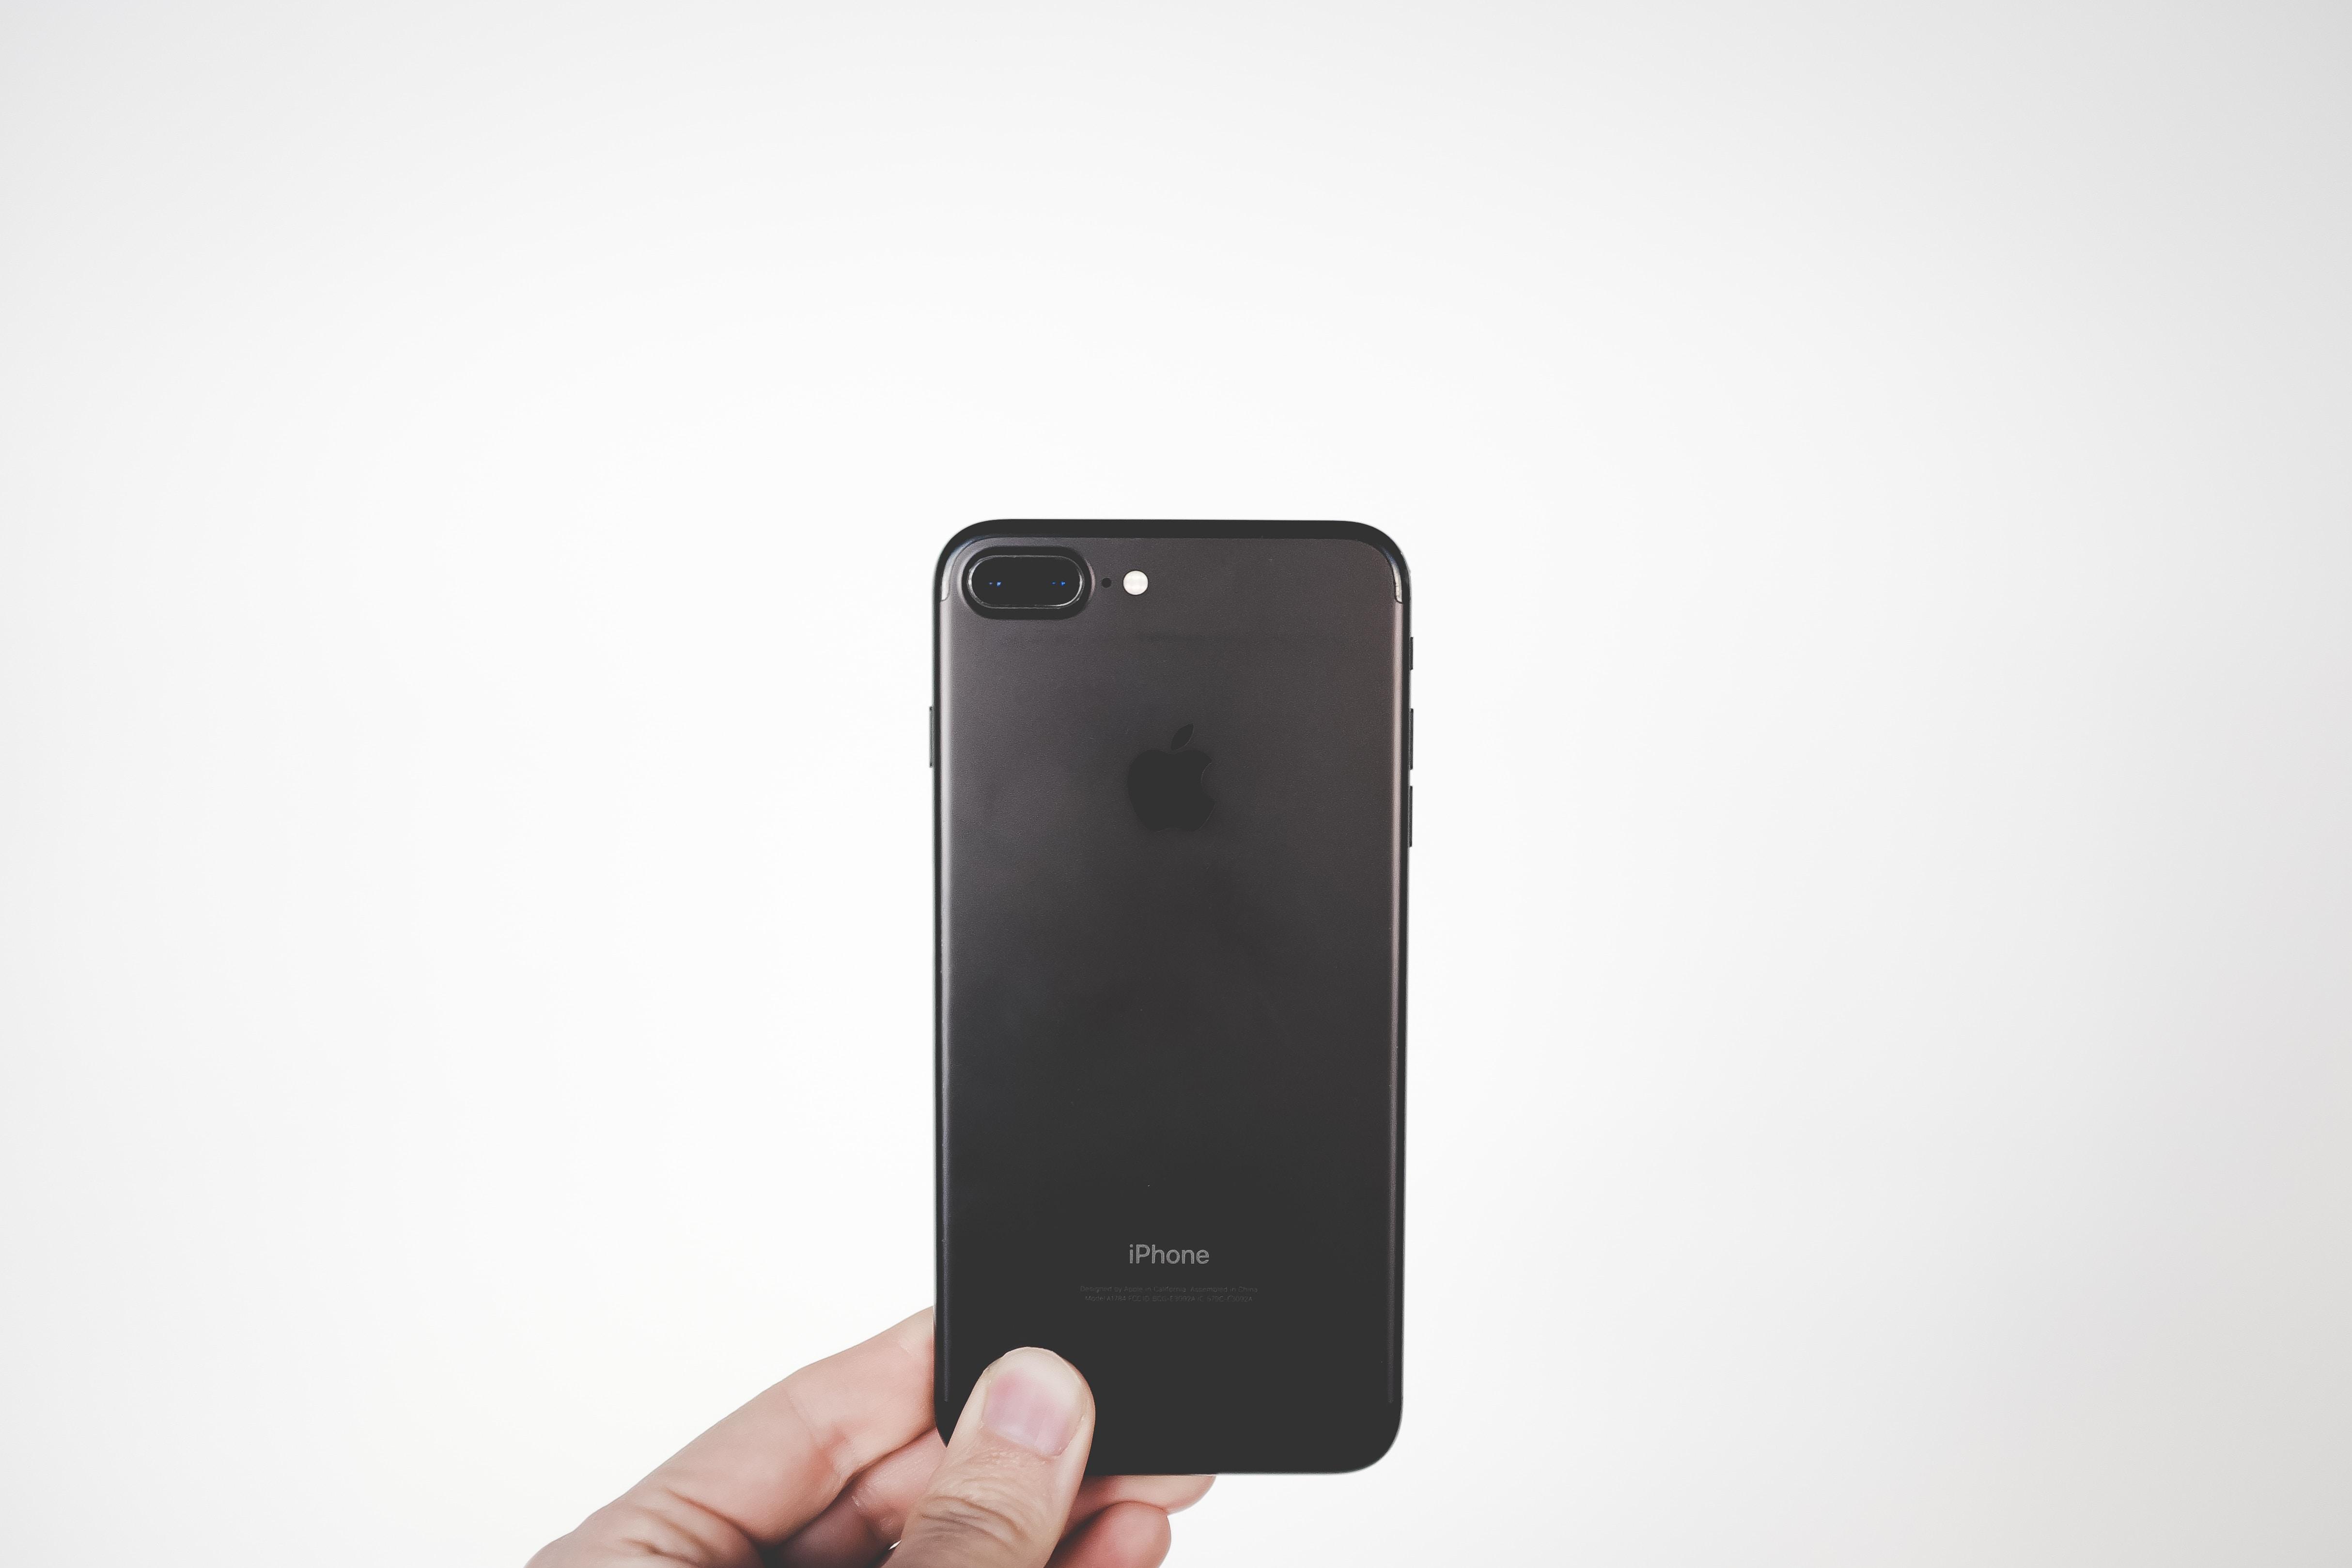 person holding black iPhone 7 Plus